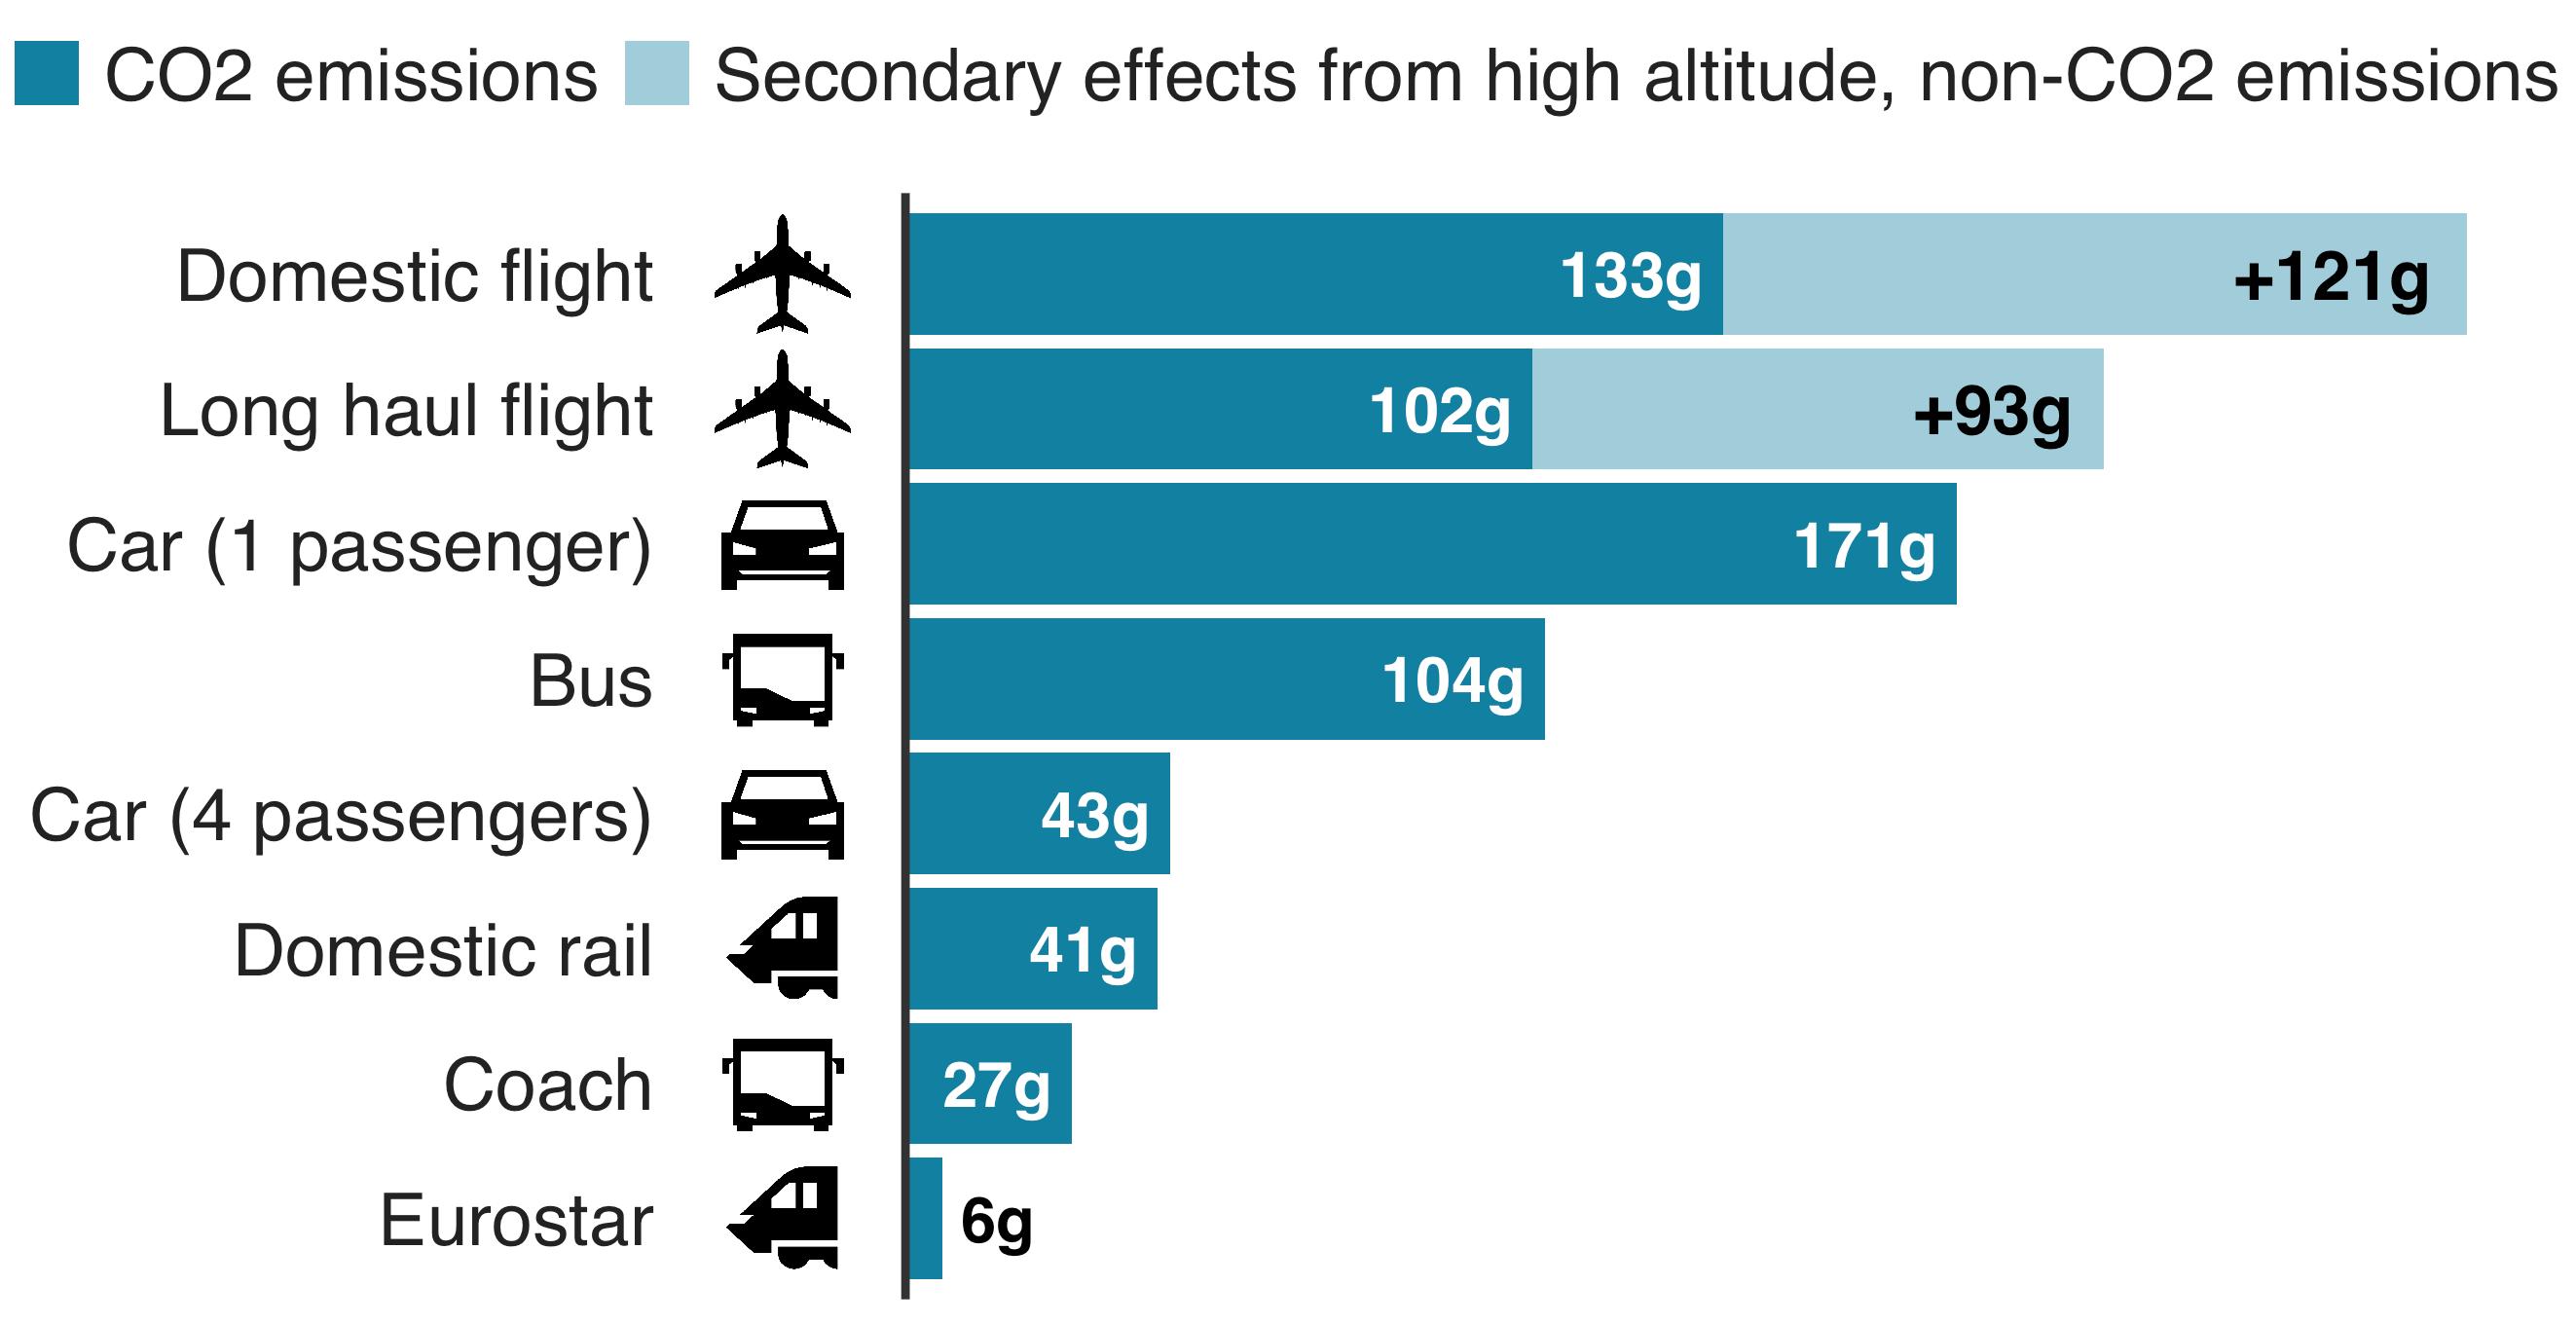 CO2 Emissions Per Passenger Per Kilometer Travelled